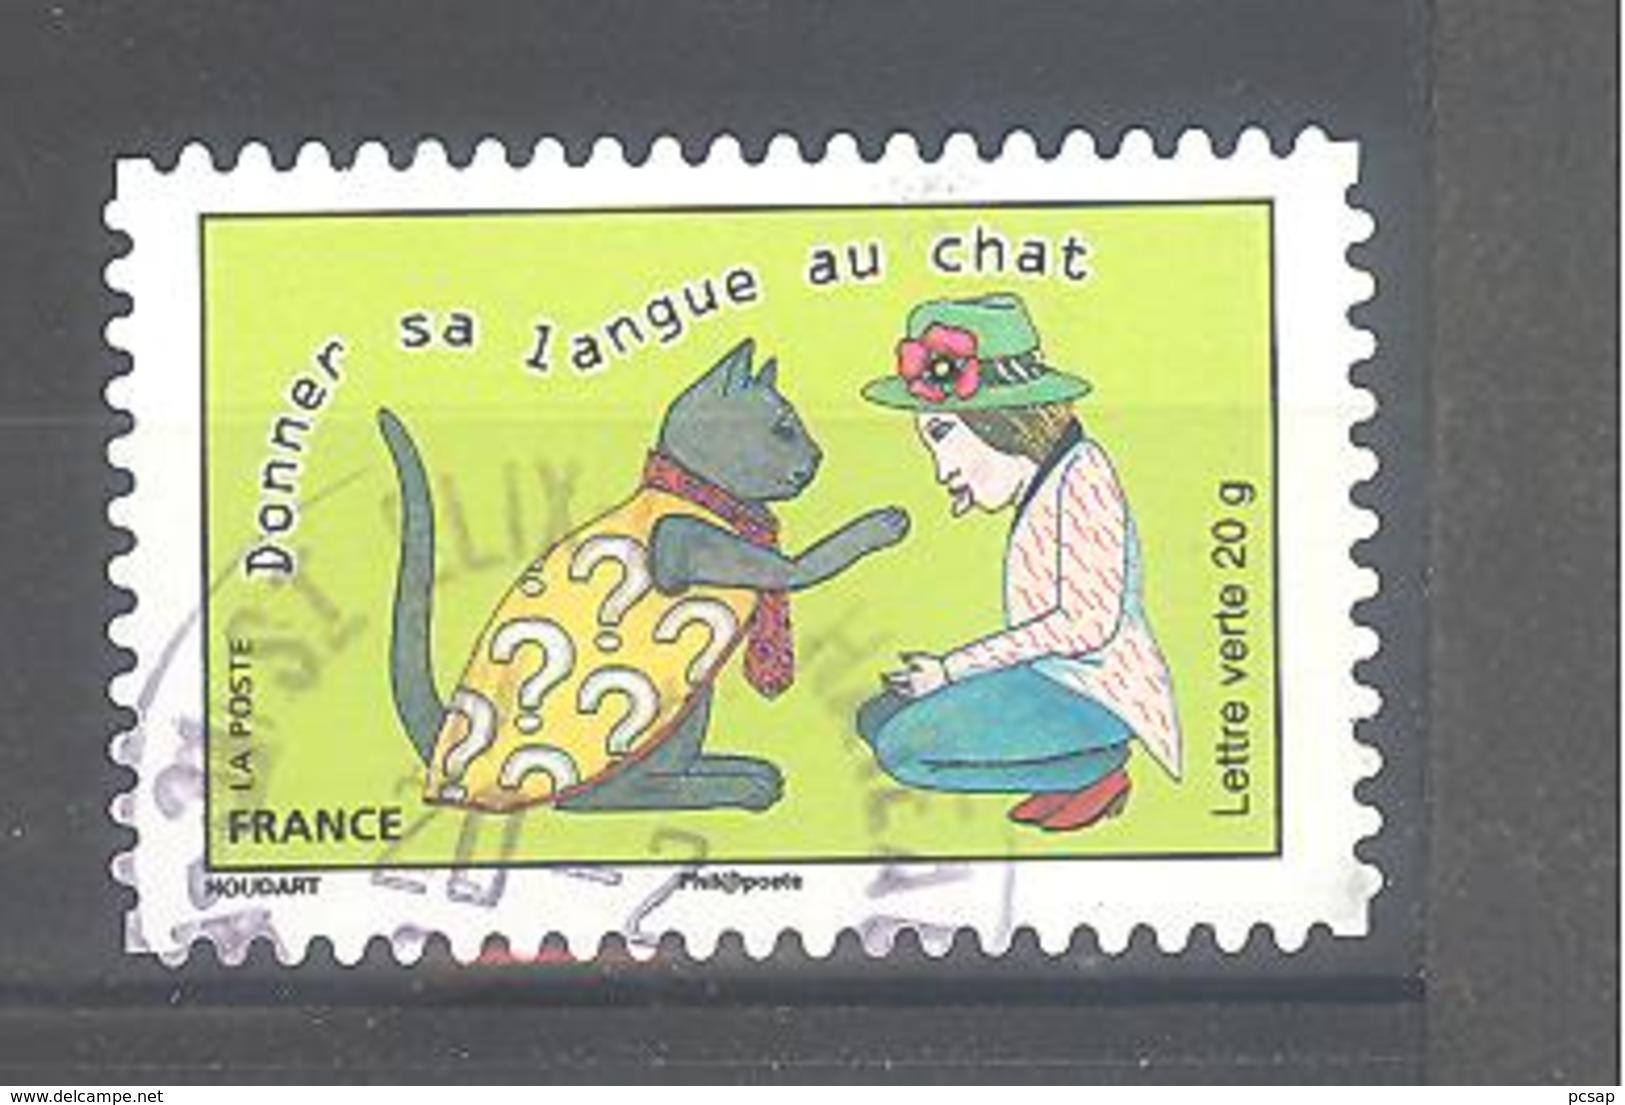 France Autoadhésif Oblitéré N°1171 (cachet Rond) - France